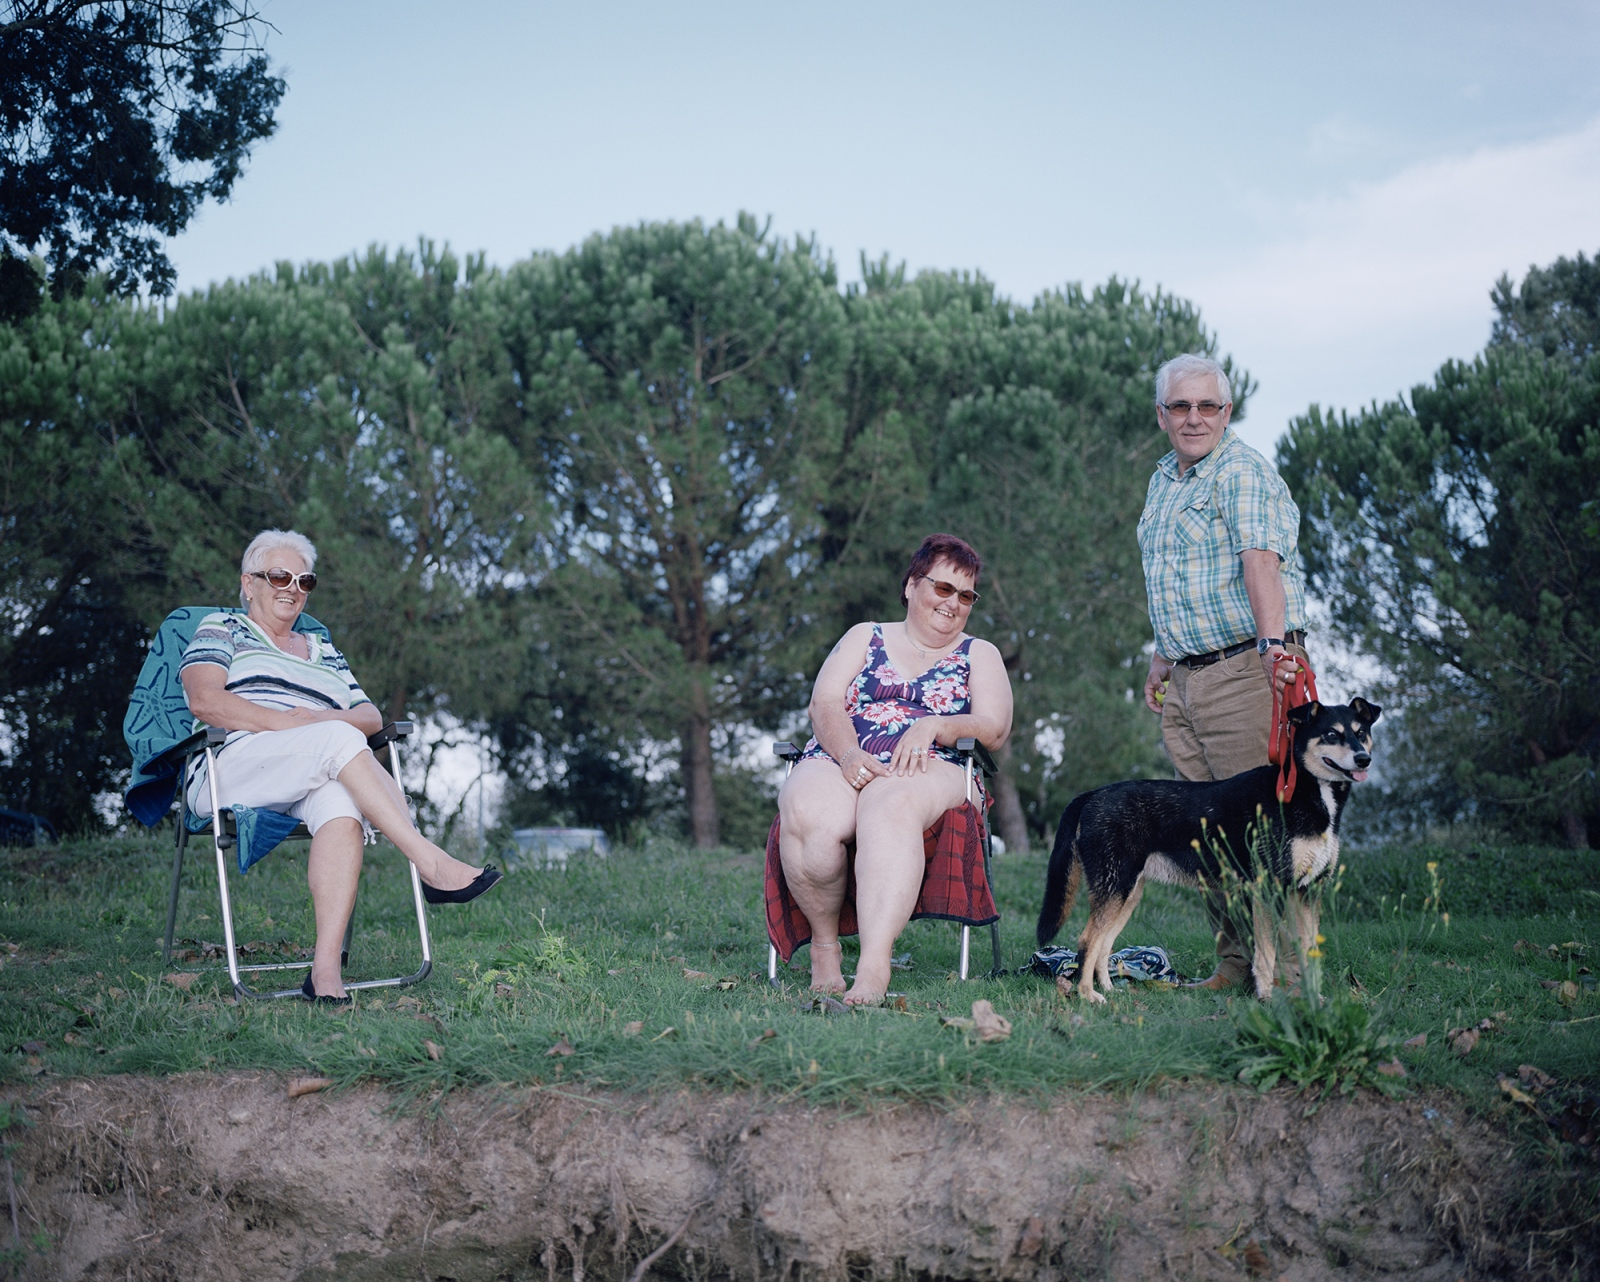 Portugal, Vila Nova de Cerveira. German tourists on the Minho River, the natural border between Portugal and Spain.